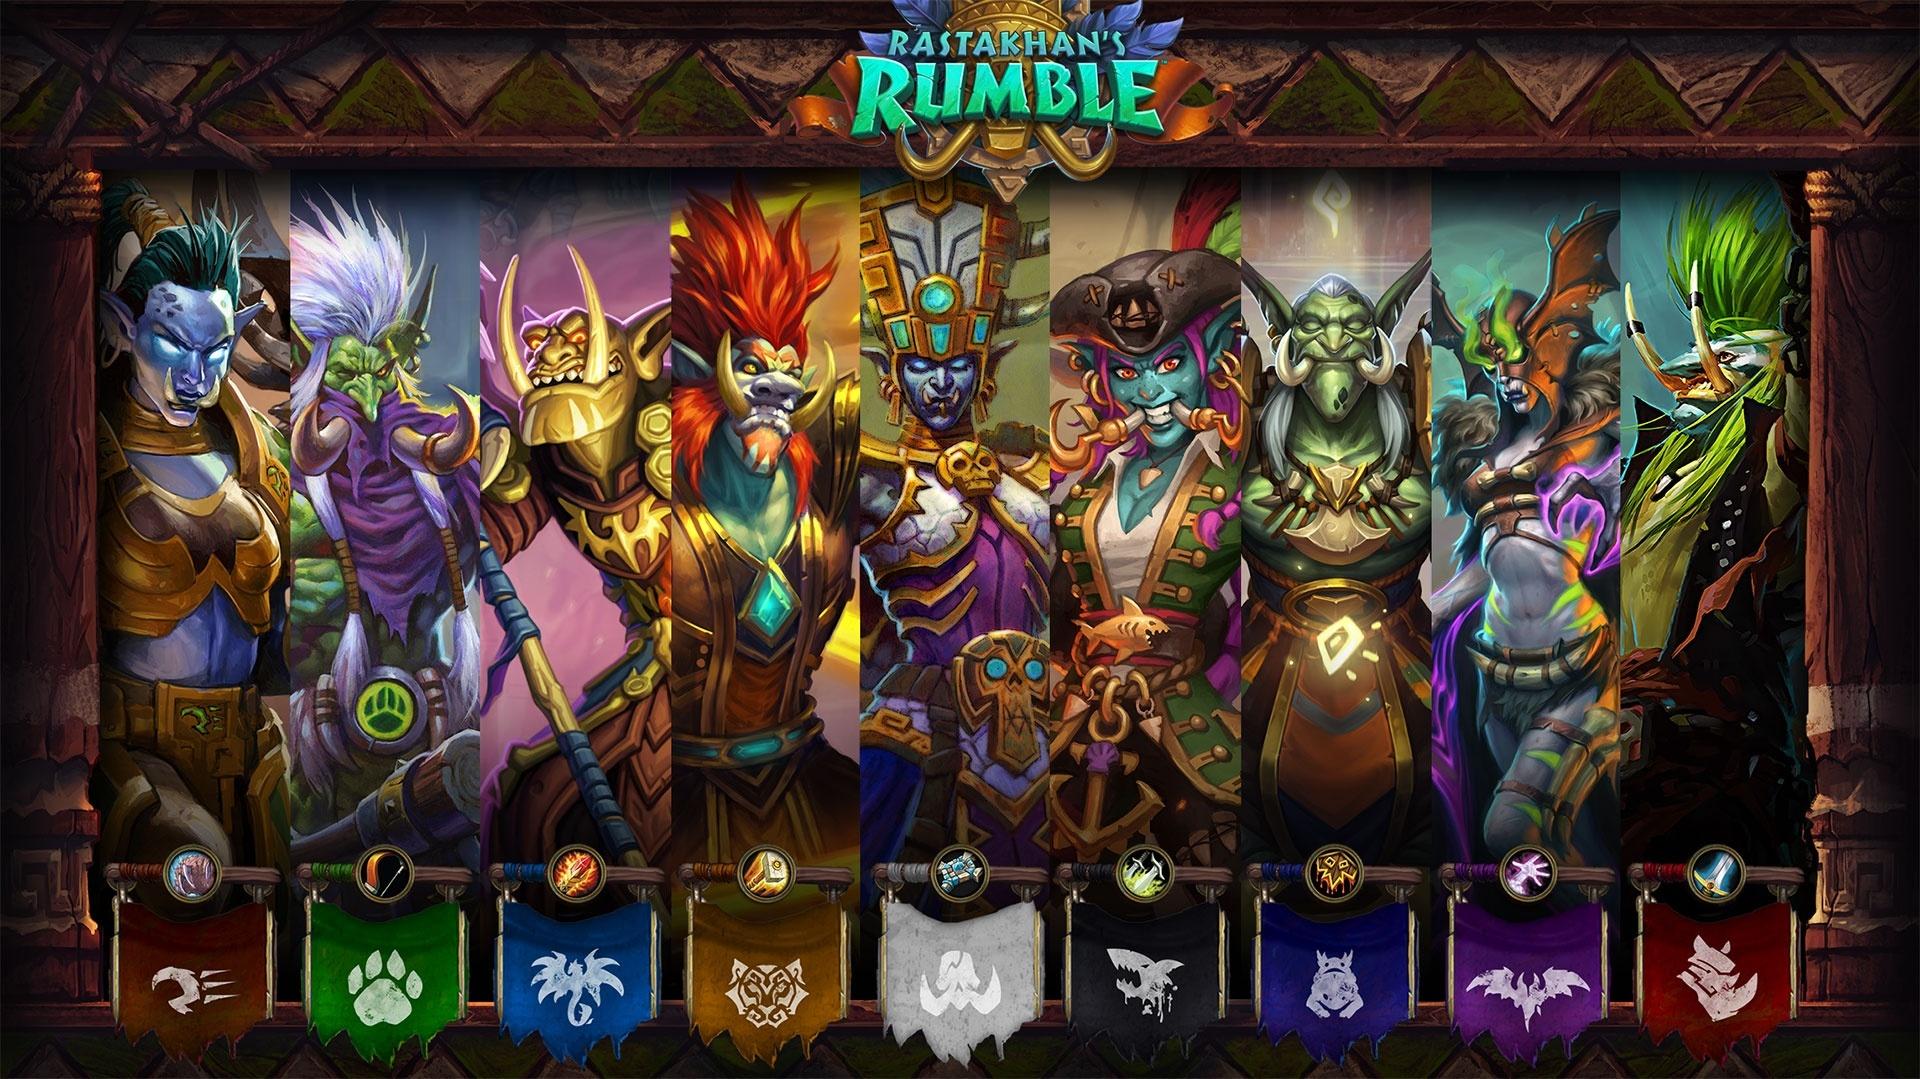 Rastakhan's Rumble - Battle for Azeroth's Alternative